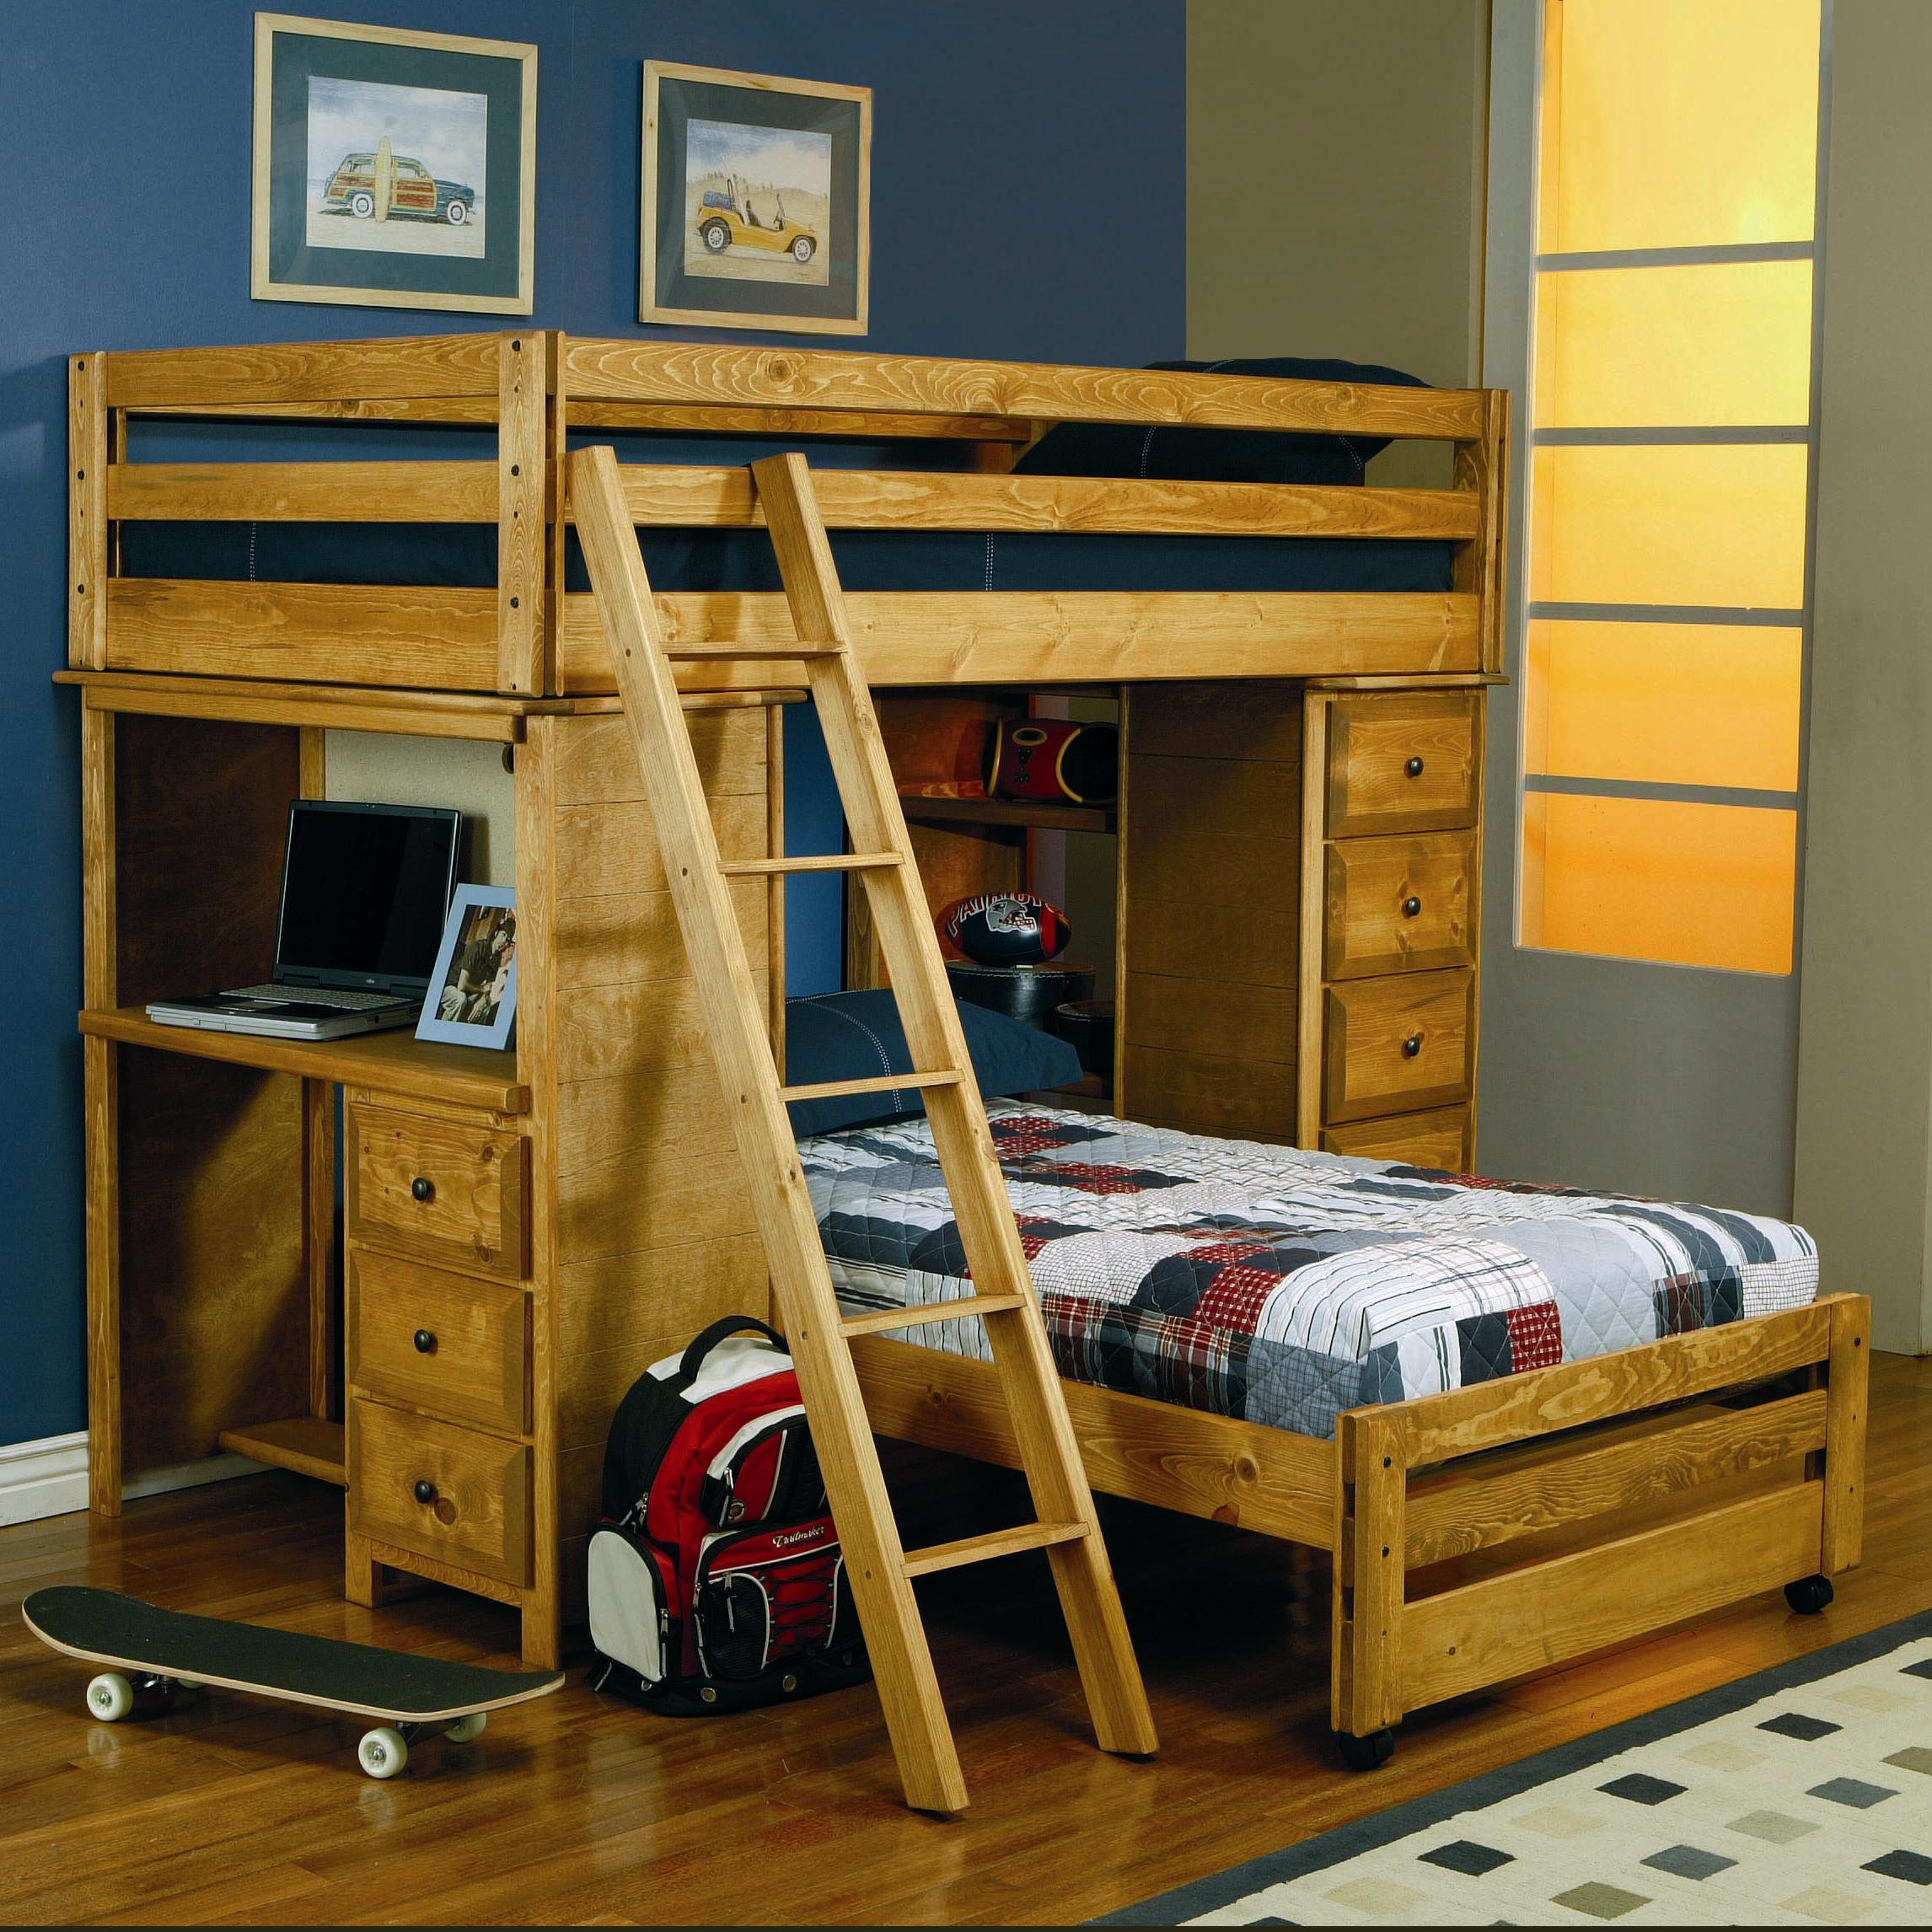 Coaster Wrangle Hill 460141 Twin Bunk Bed Northeast Factory Direct Beds Cleveland Eastlake Westlake Mentor Medina Ohio